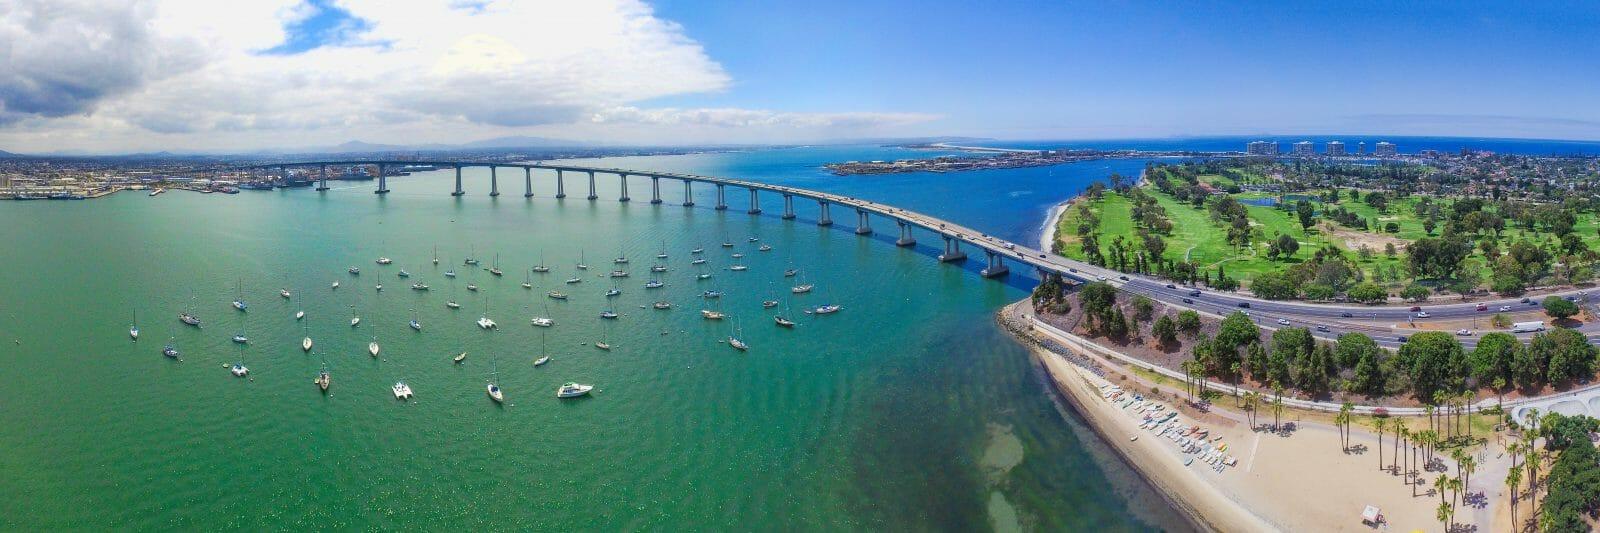 San Diego to Coronado Bridge Arial Shot